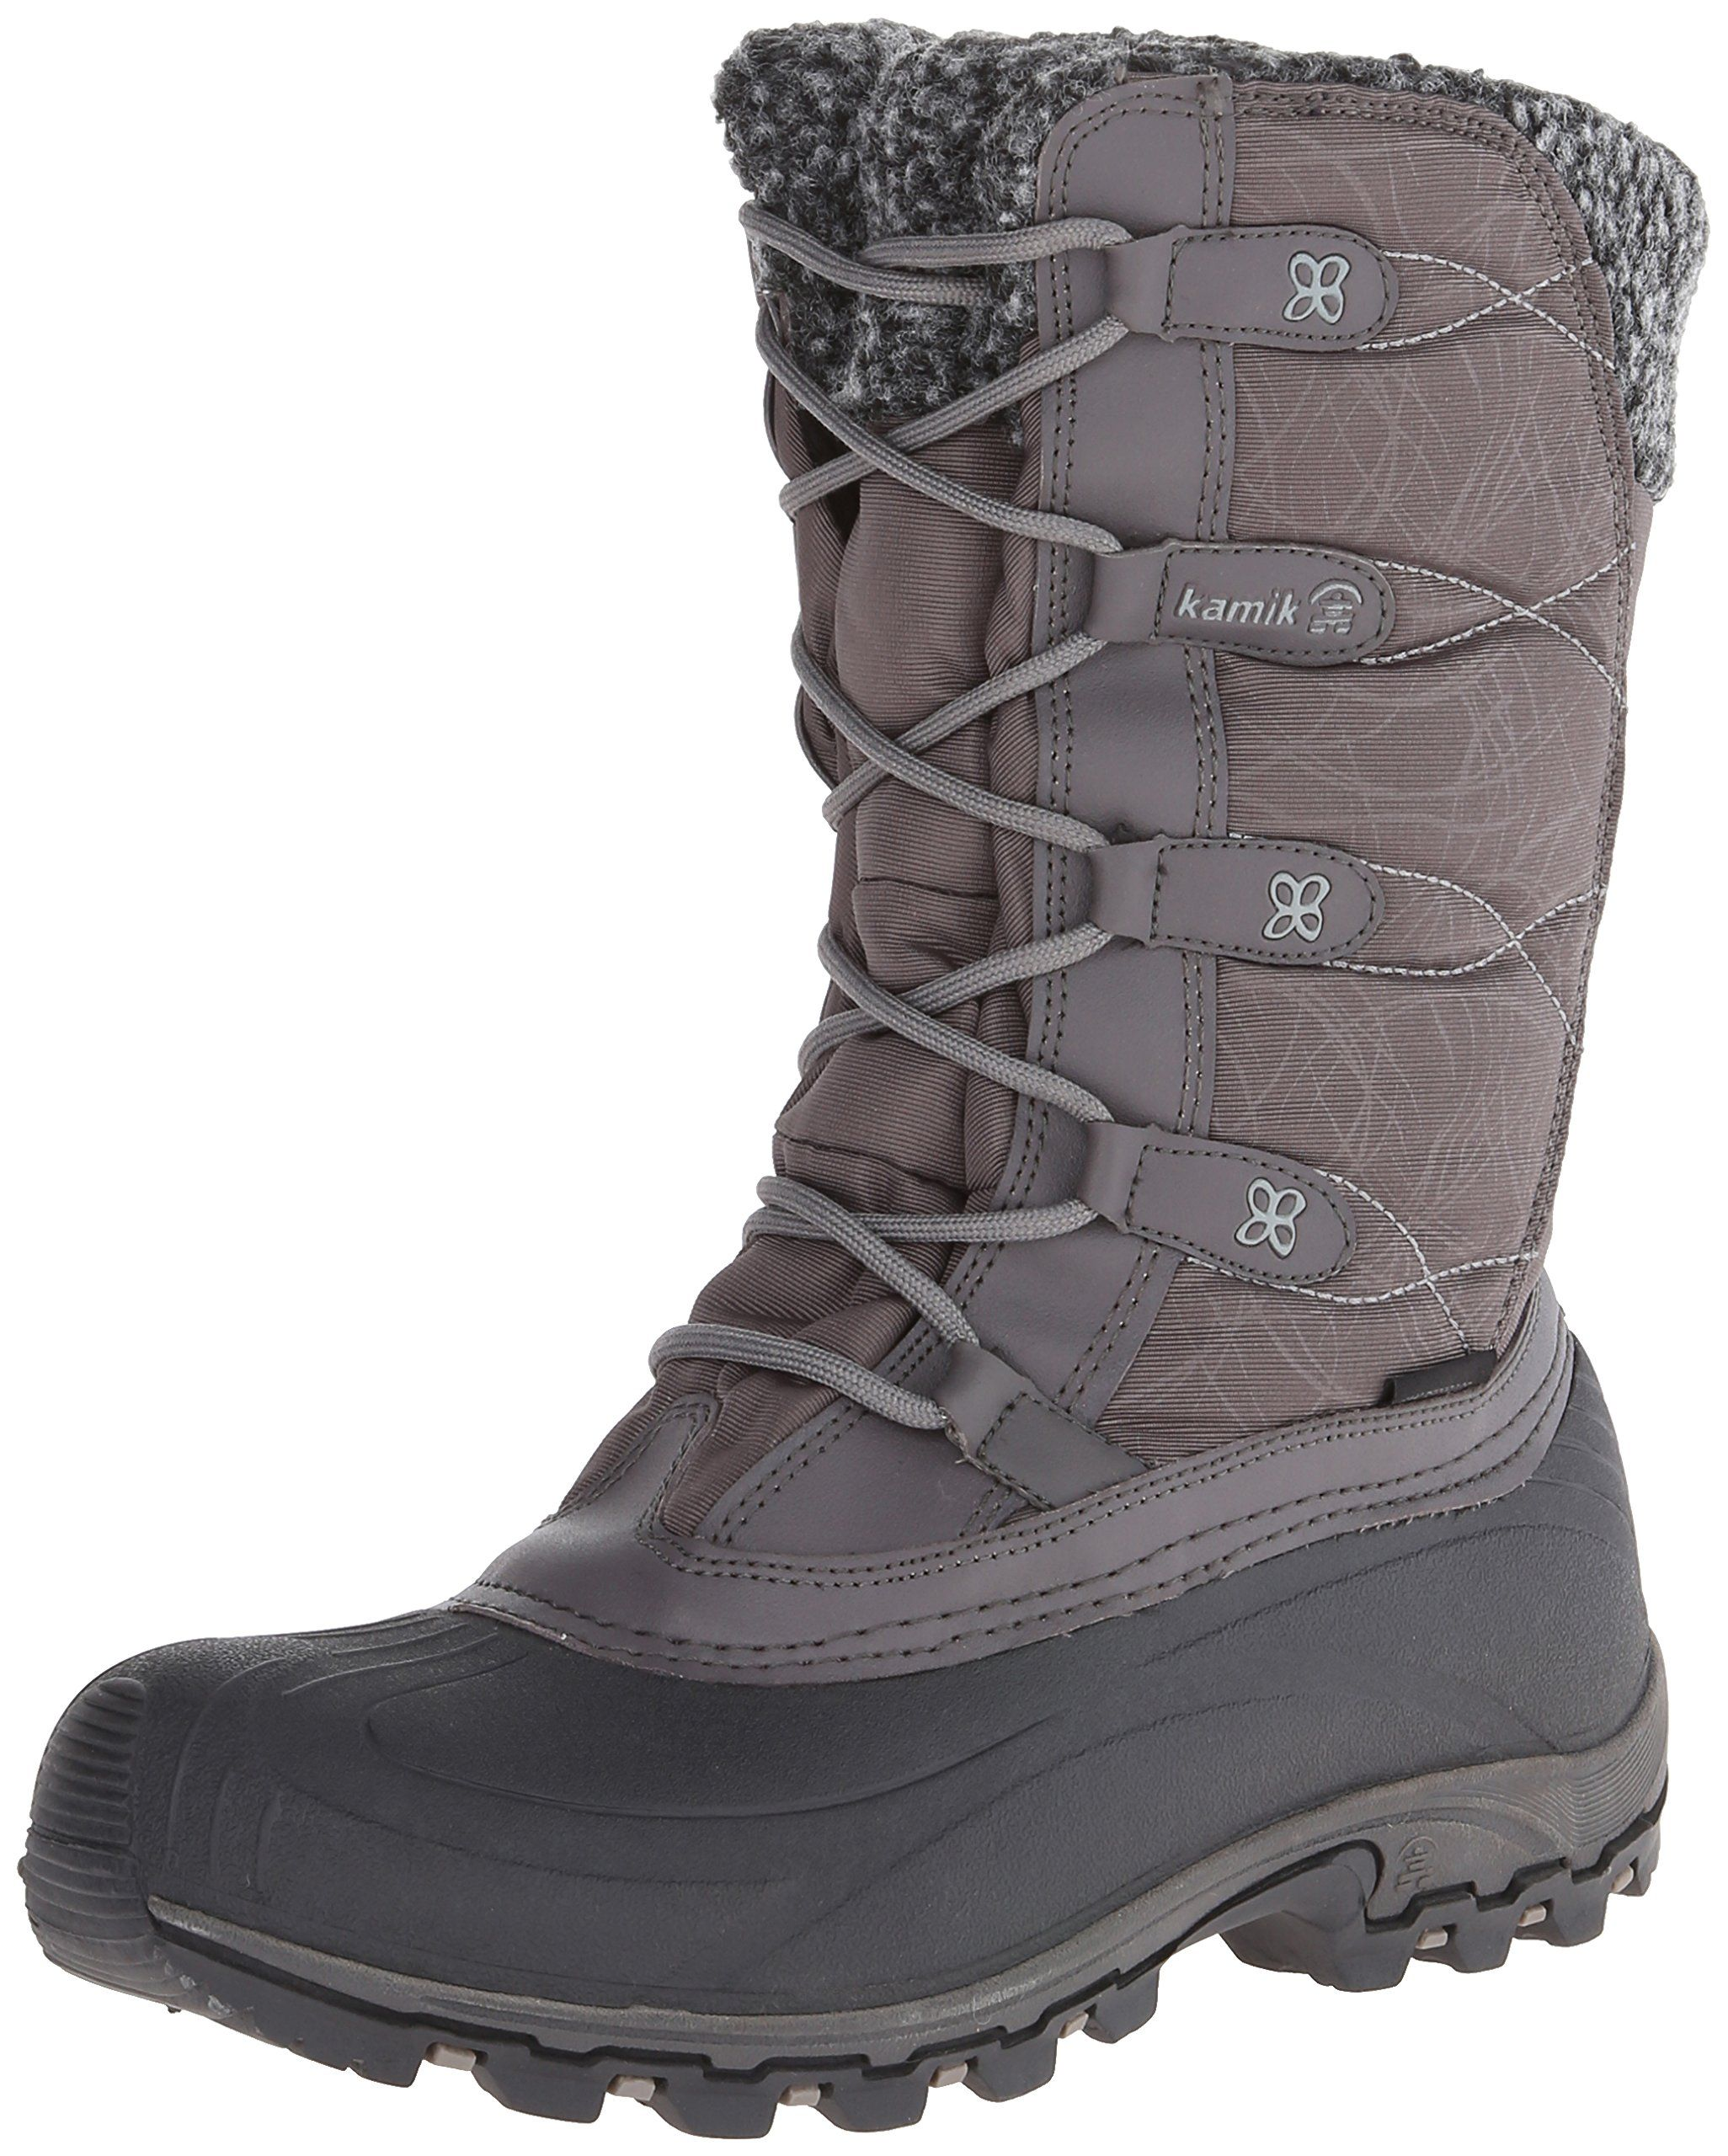 Kamik Women's Fortress Boot,Charcoal,7 M US